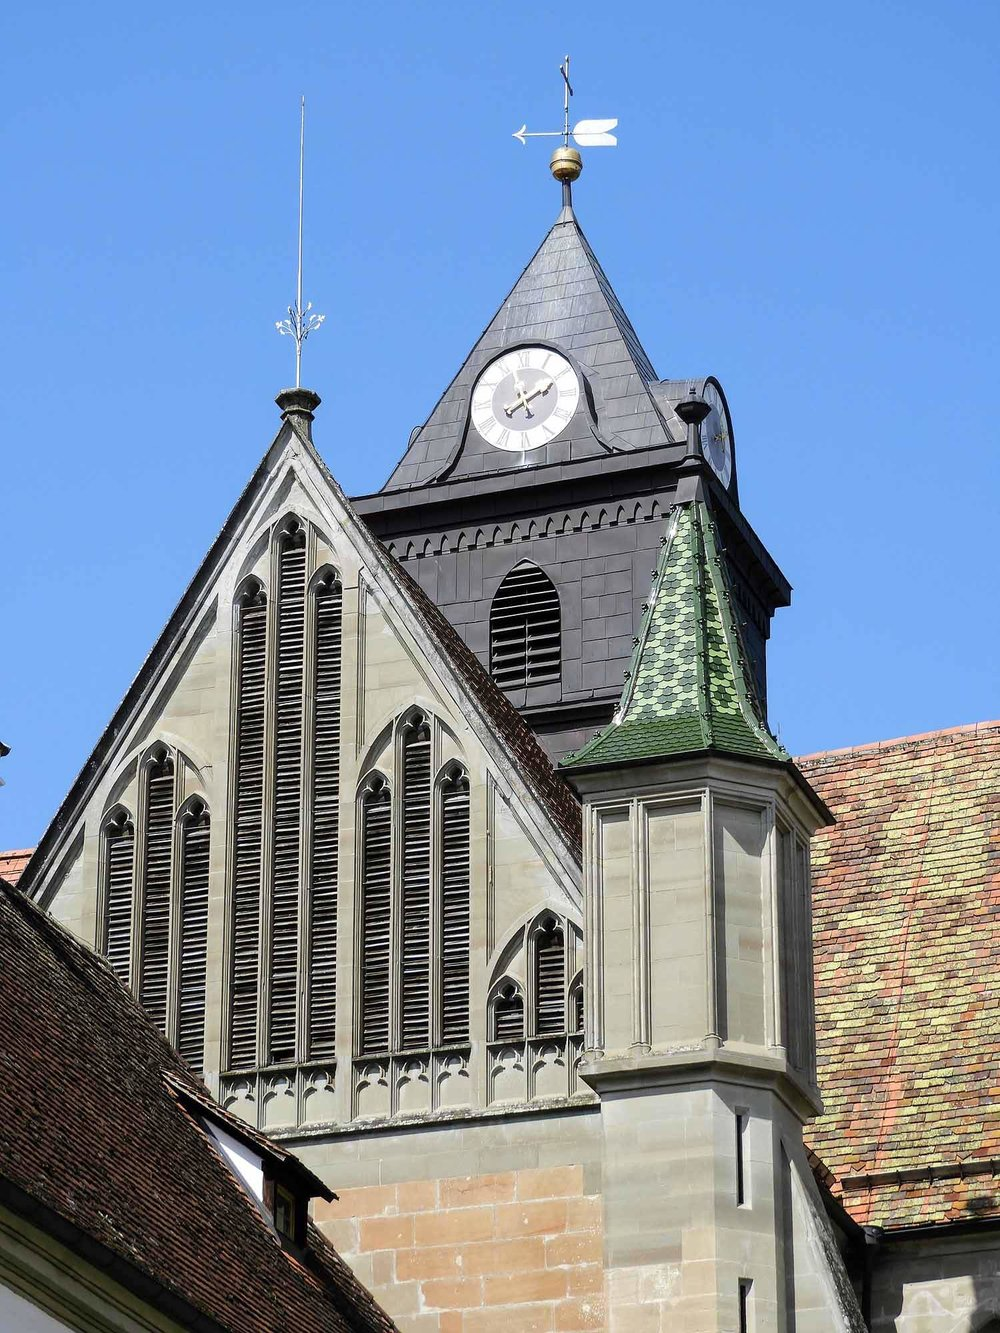 germany-salem-monastery-clock-tower.jpg